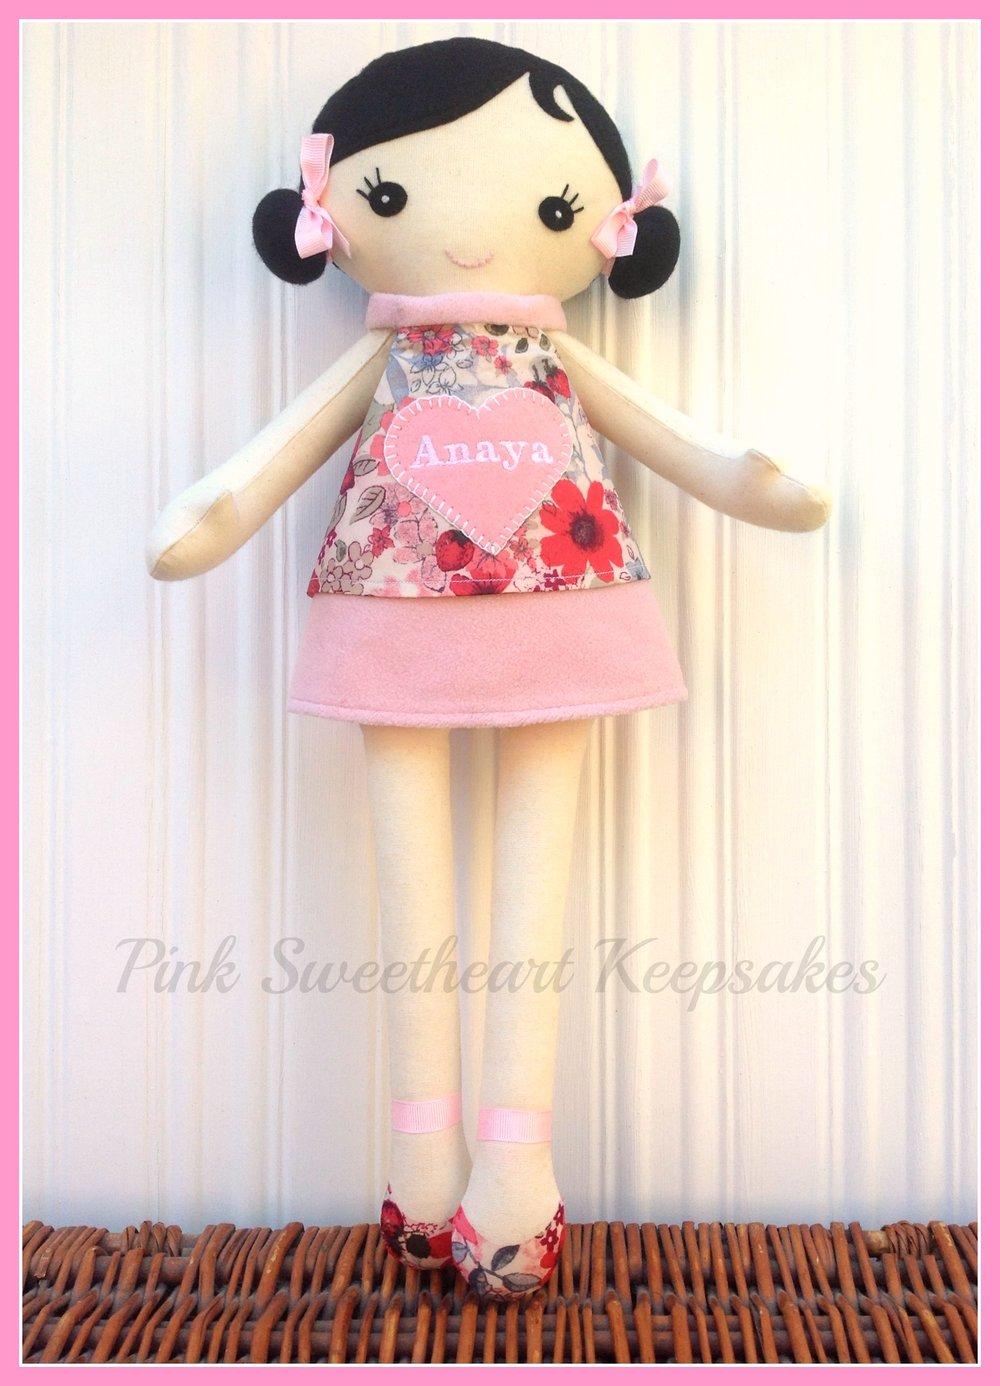 Anaya's Doll